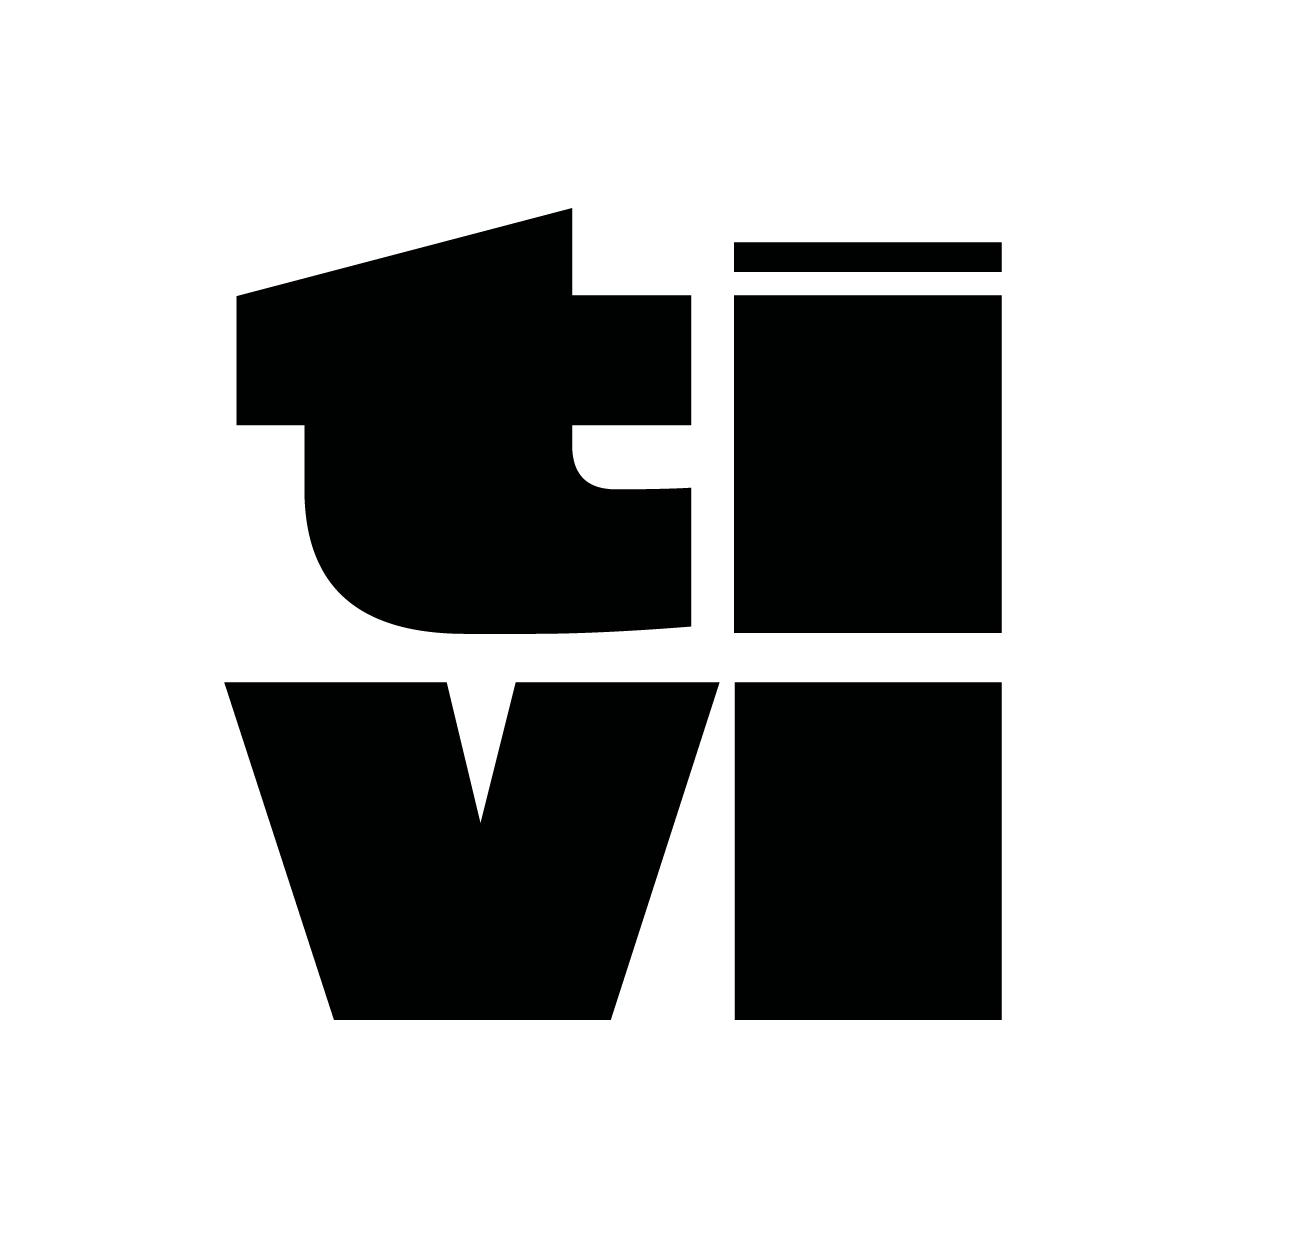 tivi_article_schema_fallback